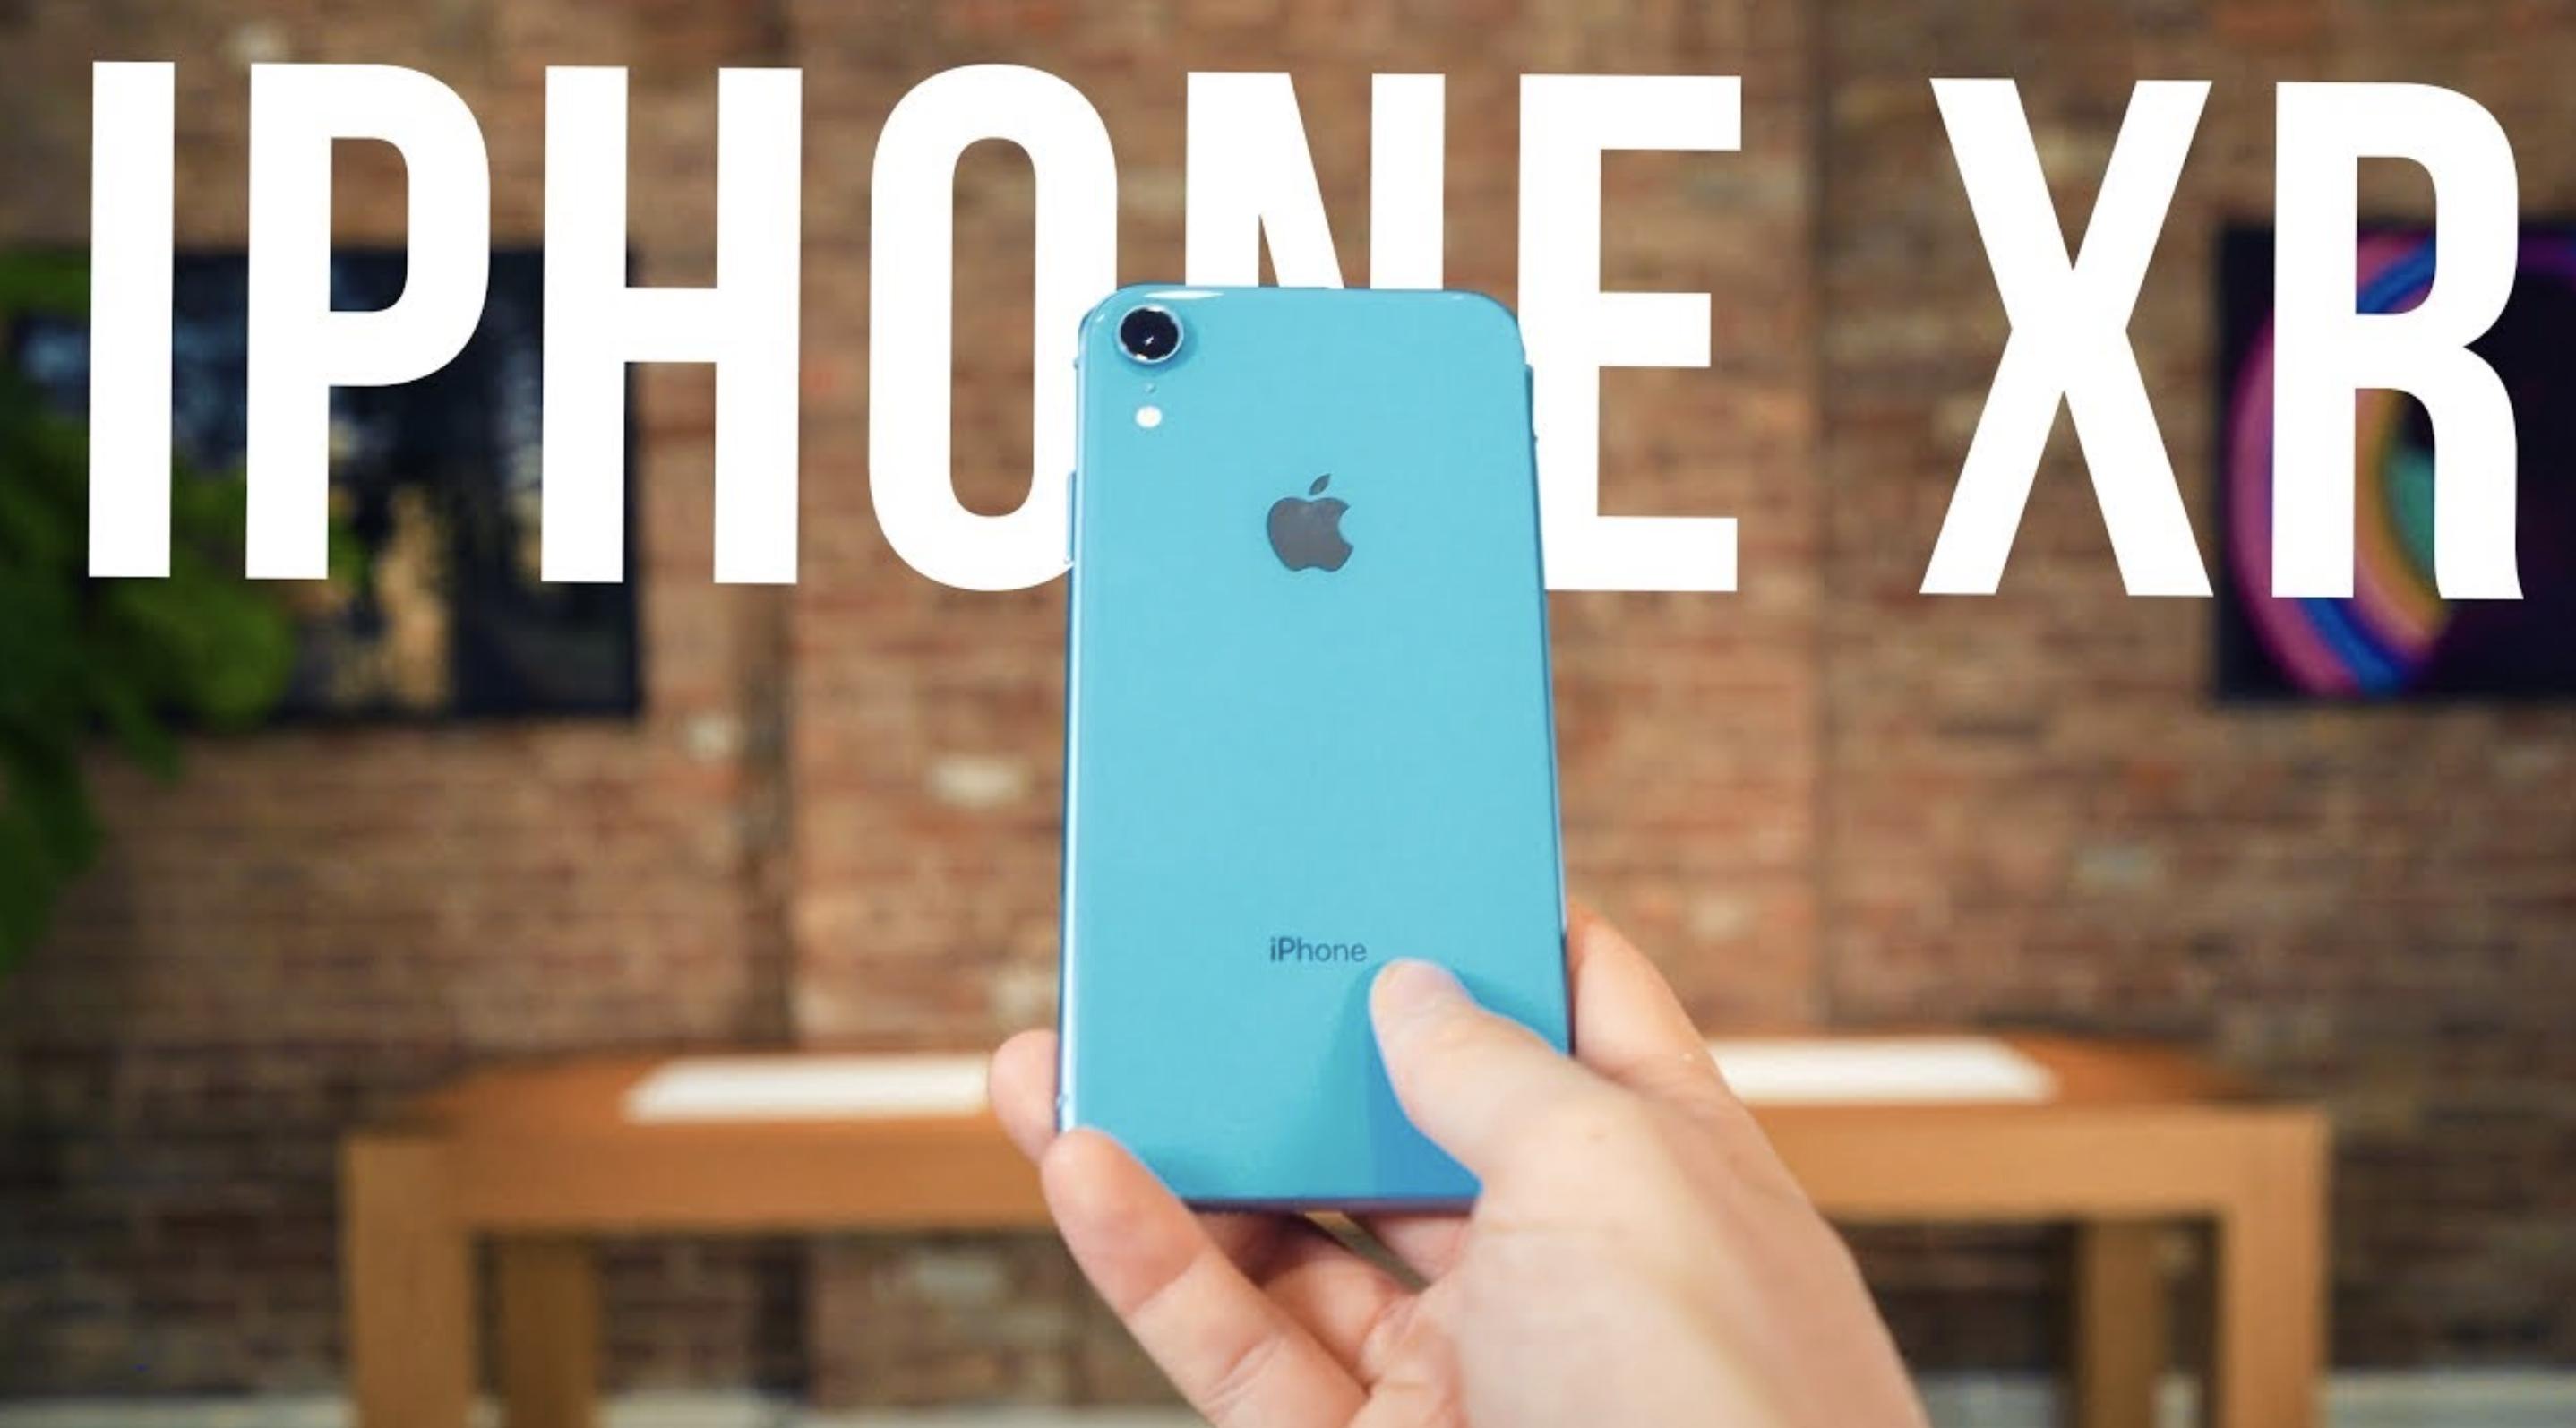 iPhone XR降价!跌至历史最低价,你还会入手吗?-第5张图片-导航站